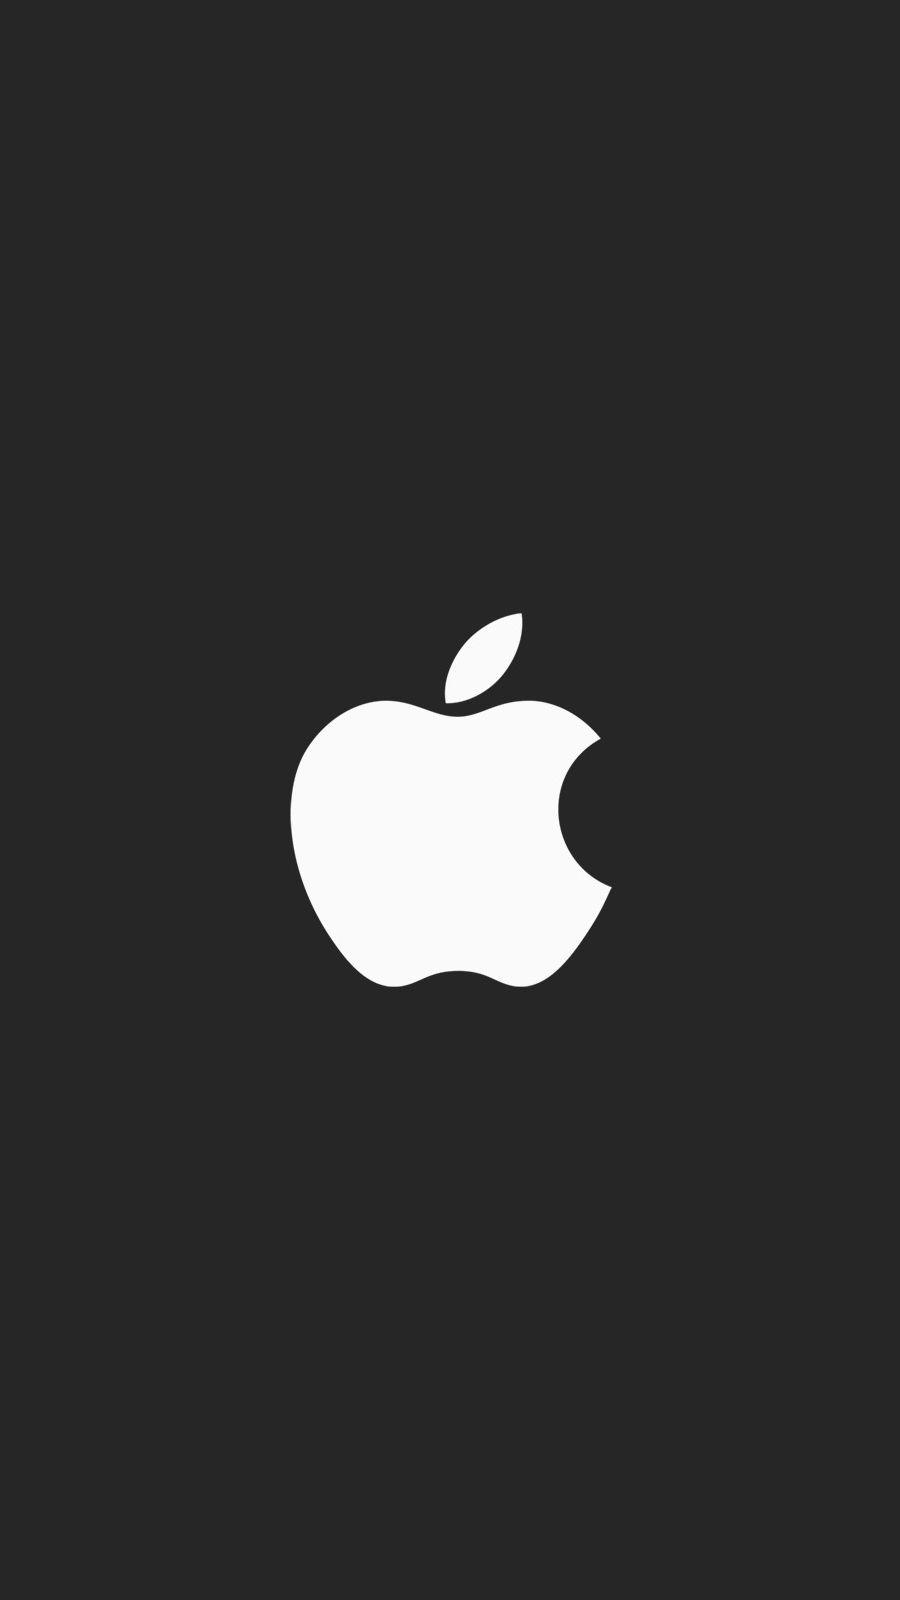 Apple minimal logo black iPhone Wallpaper(画像あり) Iphone7